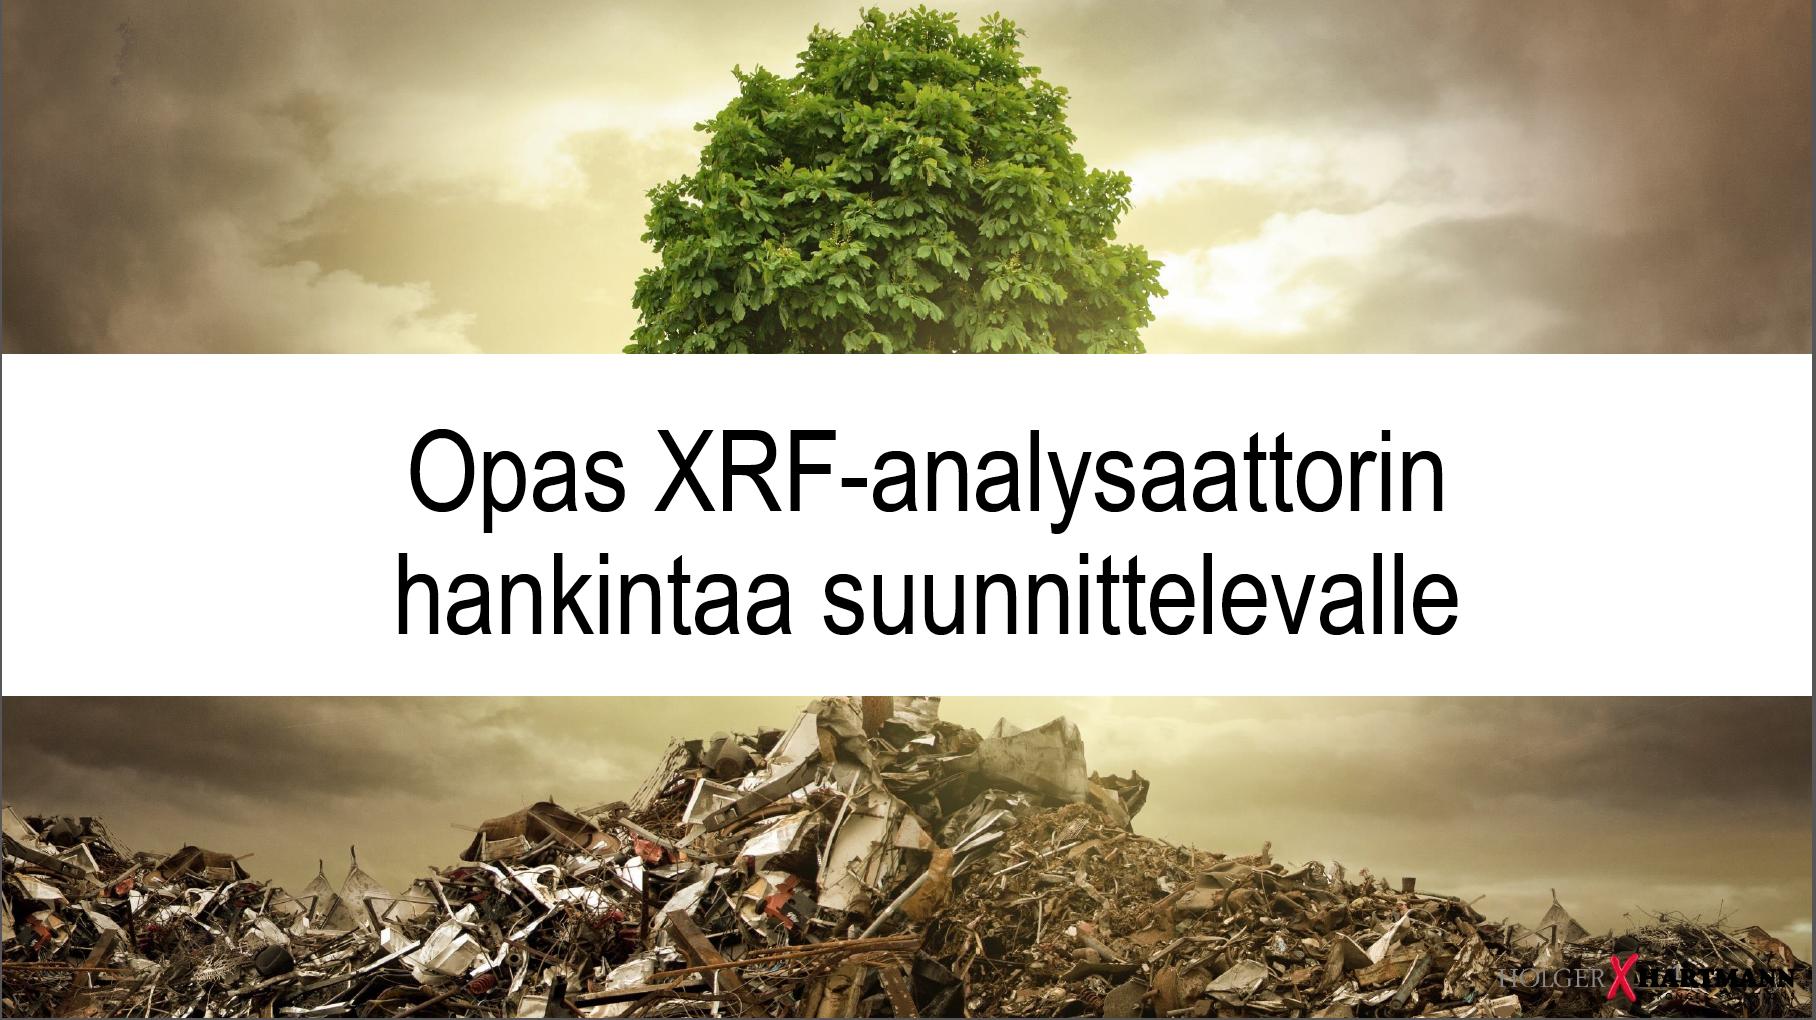 XRF-analysaattorin-ostajan-opas-kansi.png